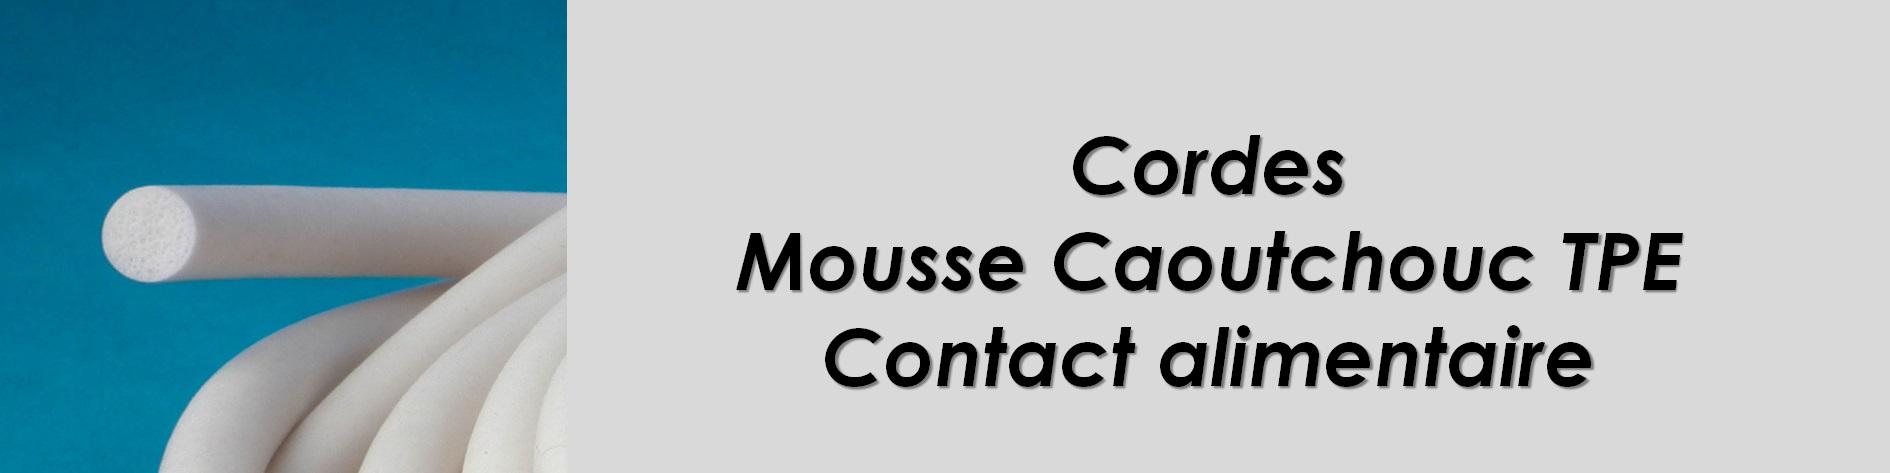 Corde Mousse Tpe, FDA